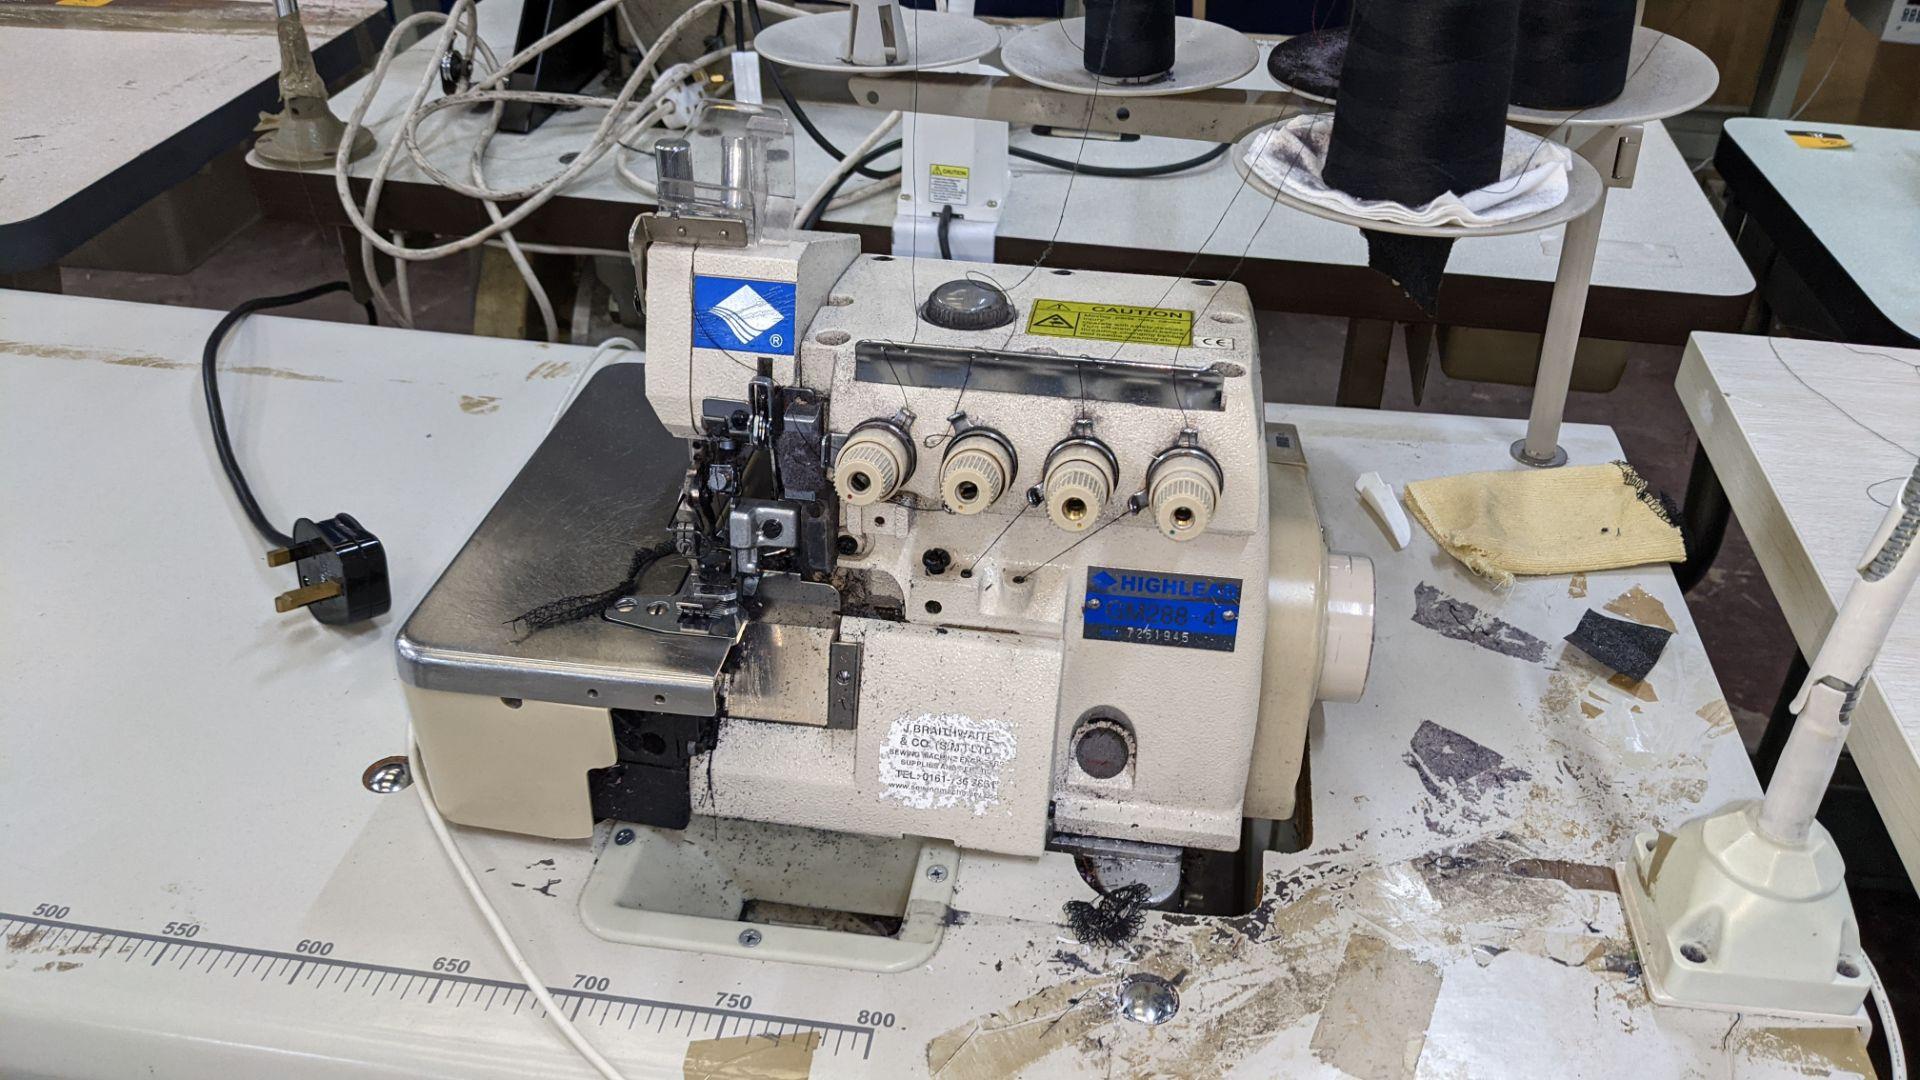 Highlead overlocker model GM288-4 - Image 5 of 16